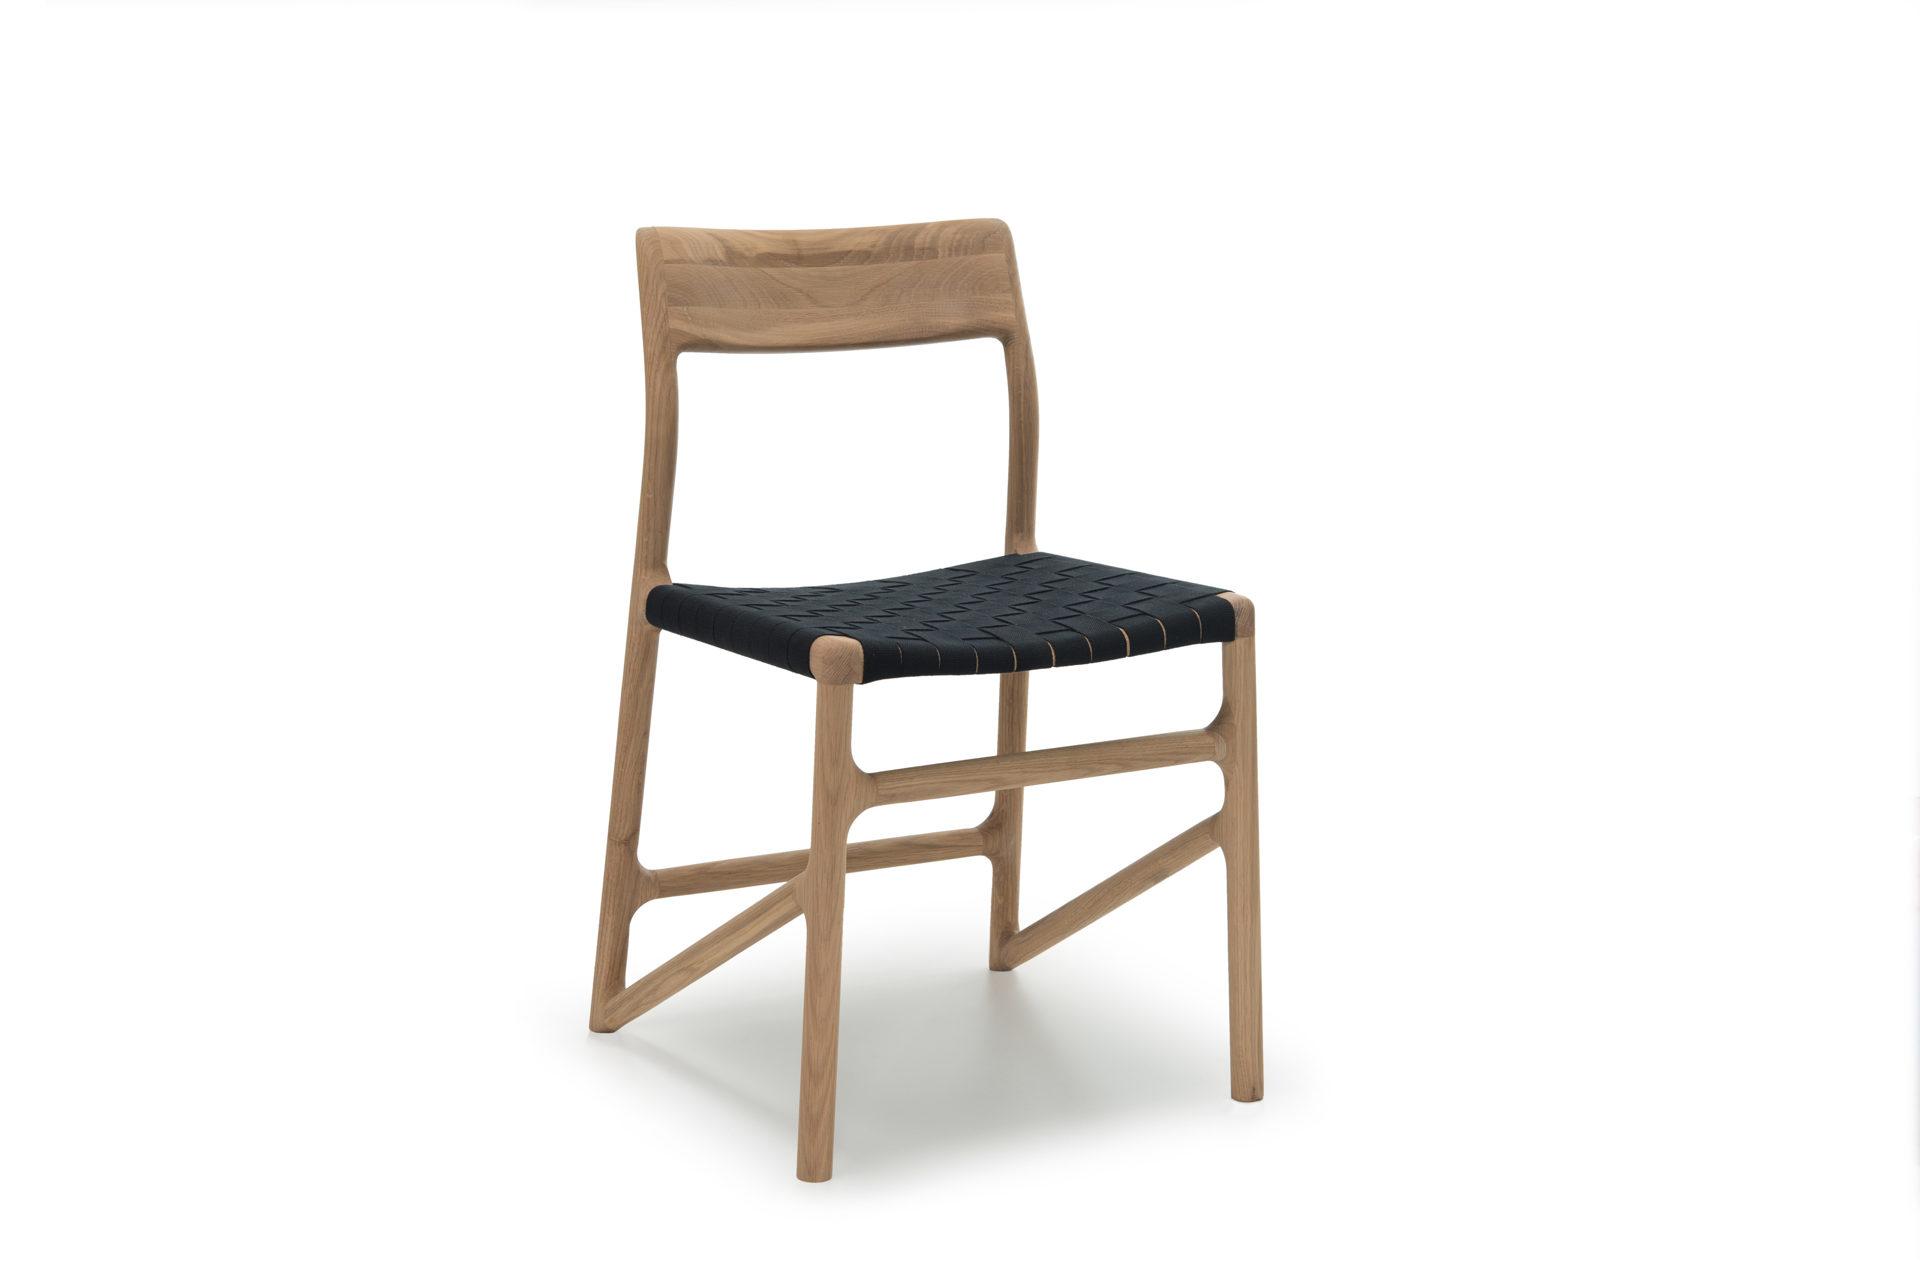 Stühle modern holz  Möbel Angermüller Bad Neustadt-Salz | GAZZDA Stuhl Fawn, schwarz ...